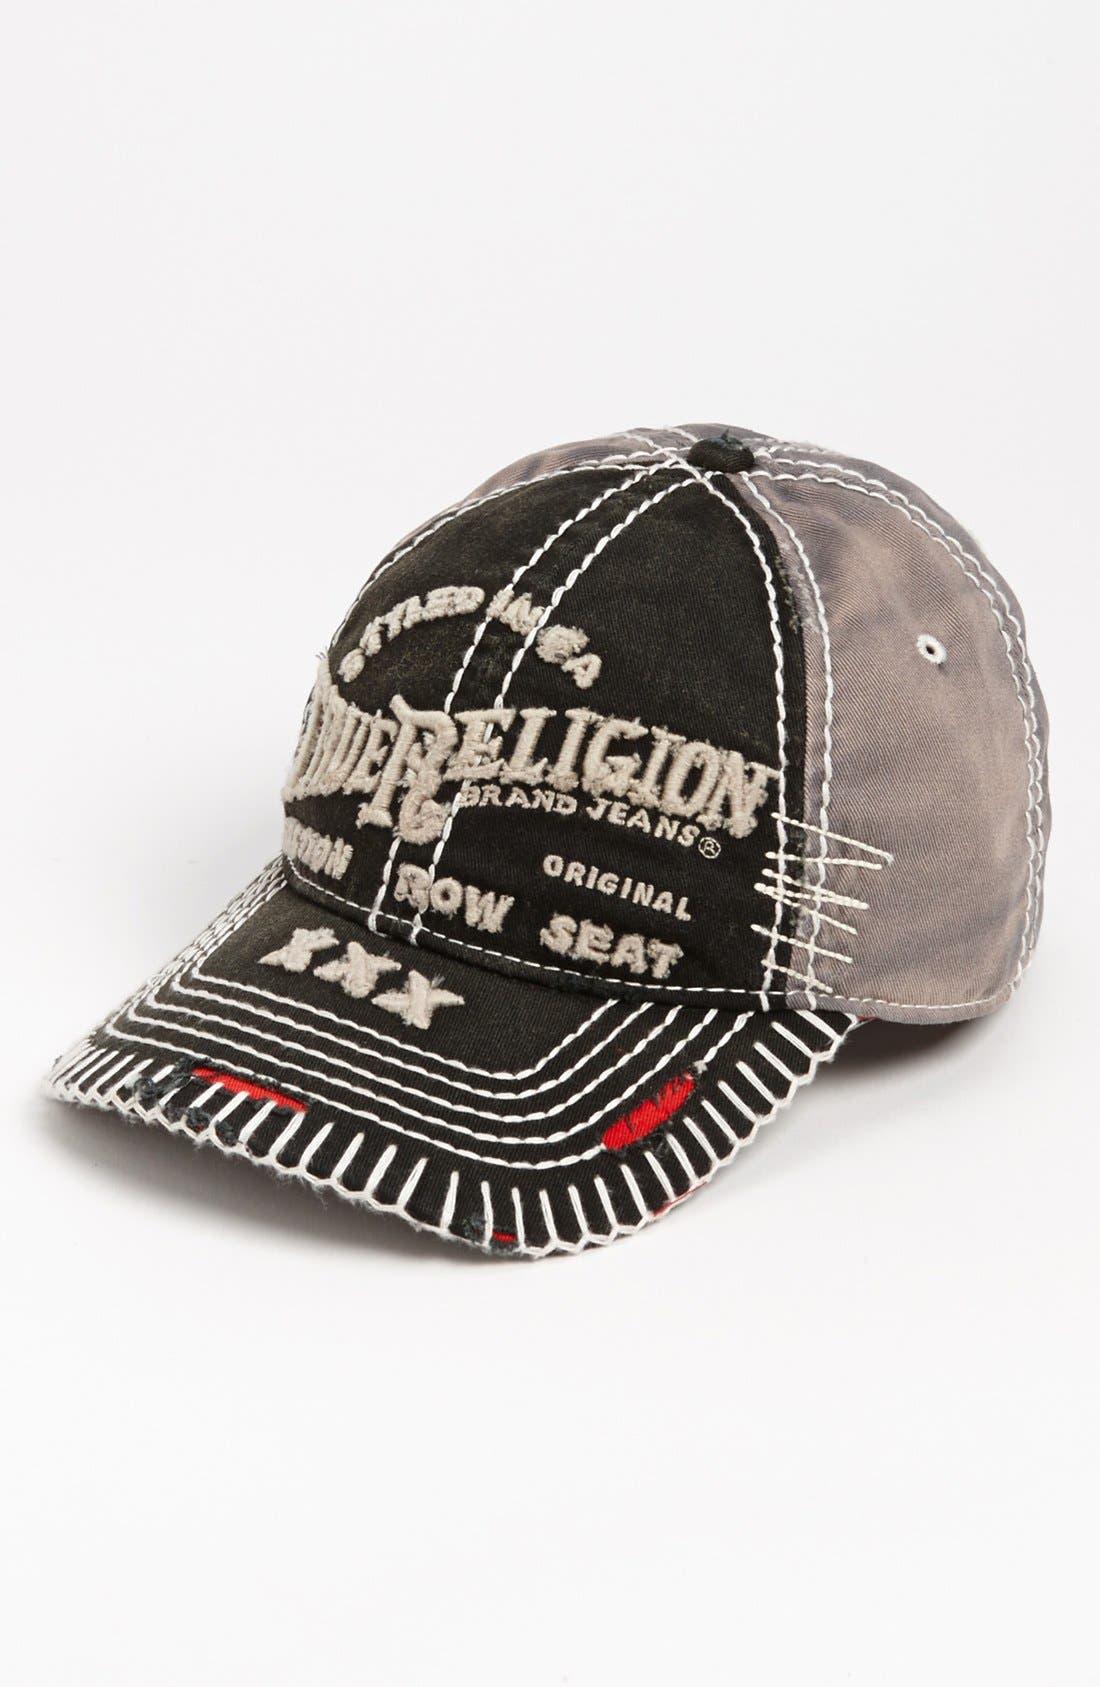 Main Image - True Religion Brand Jeans 'Triple X' Baseball Cap